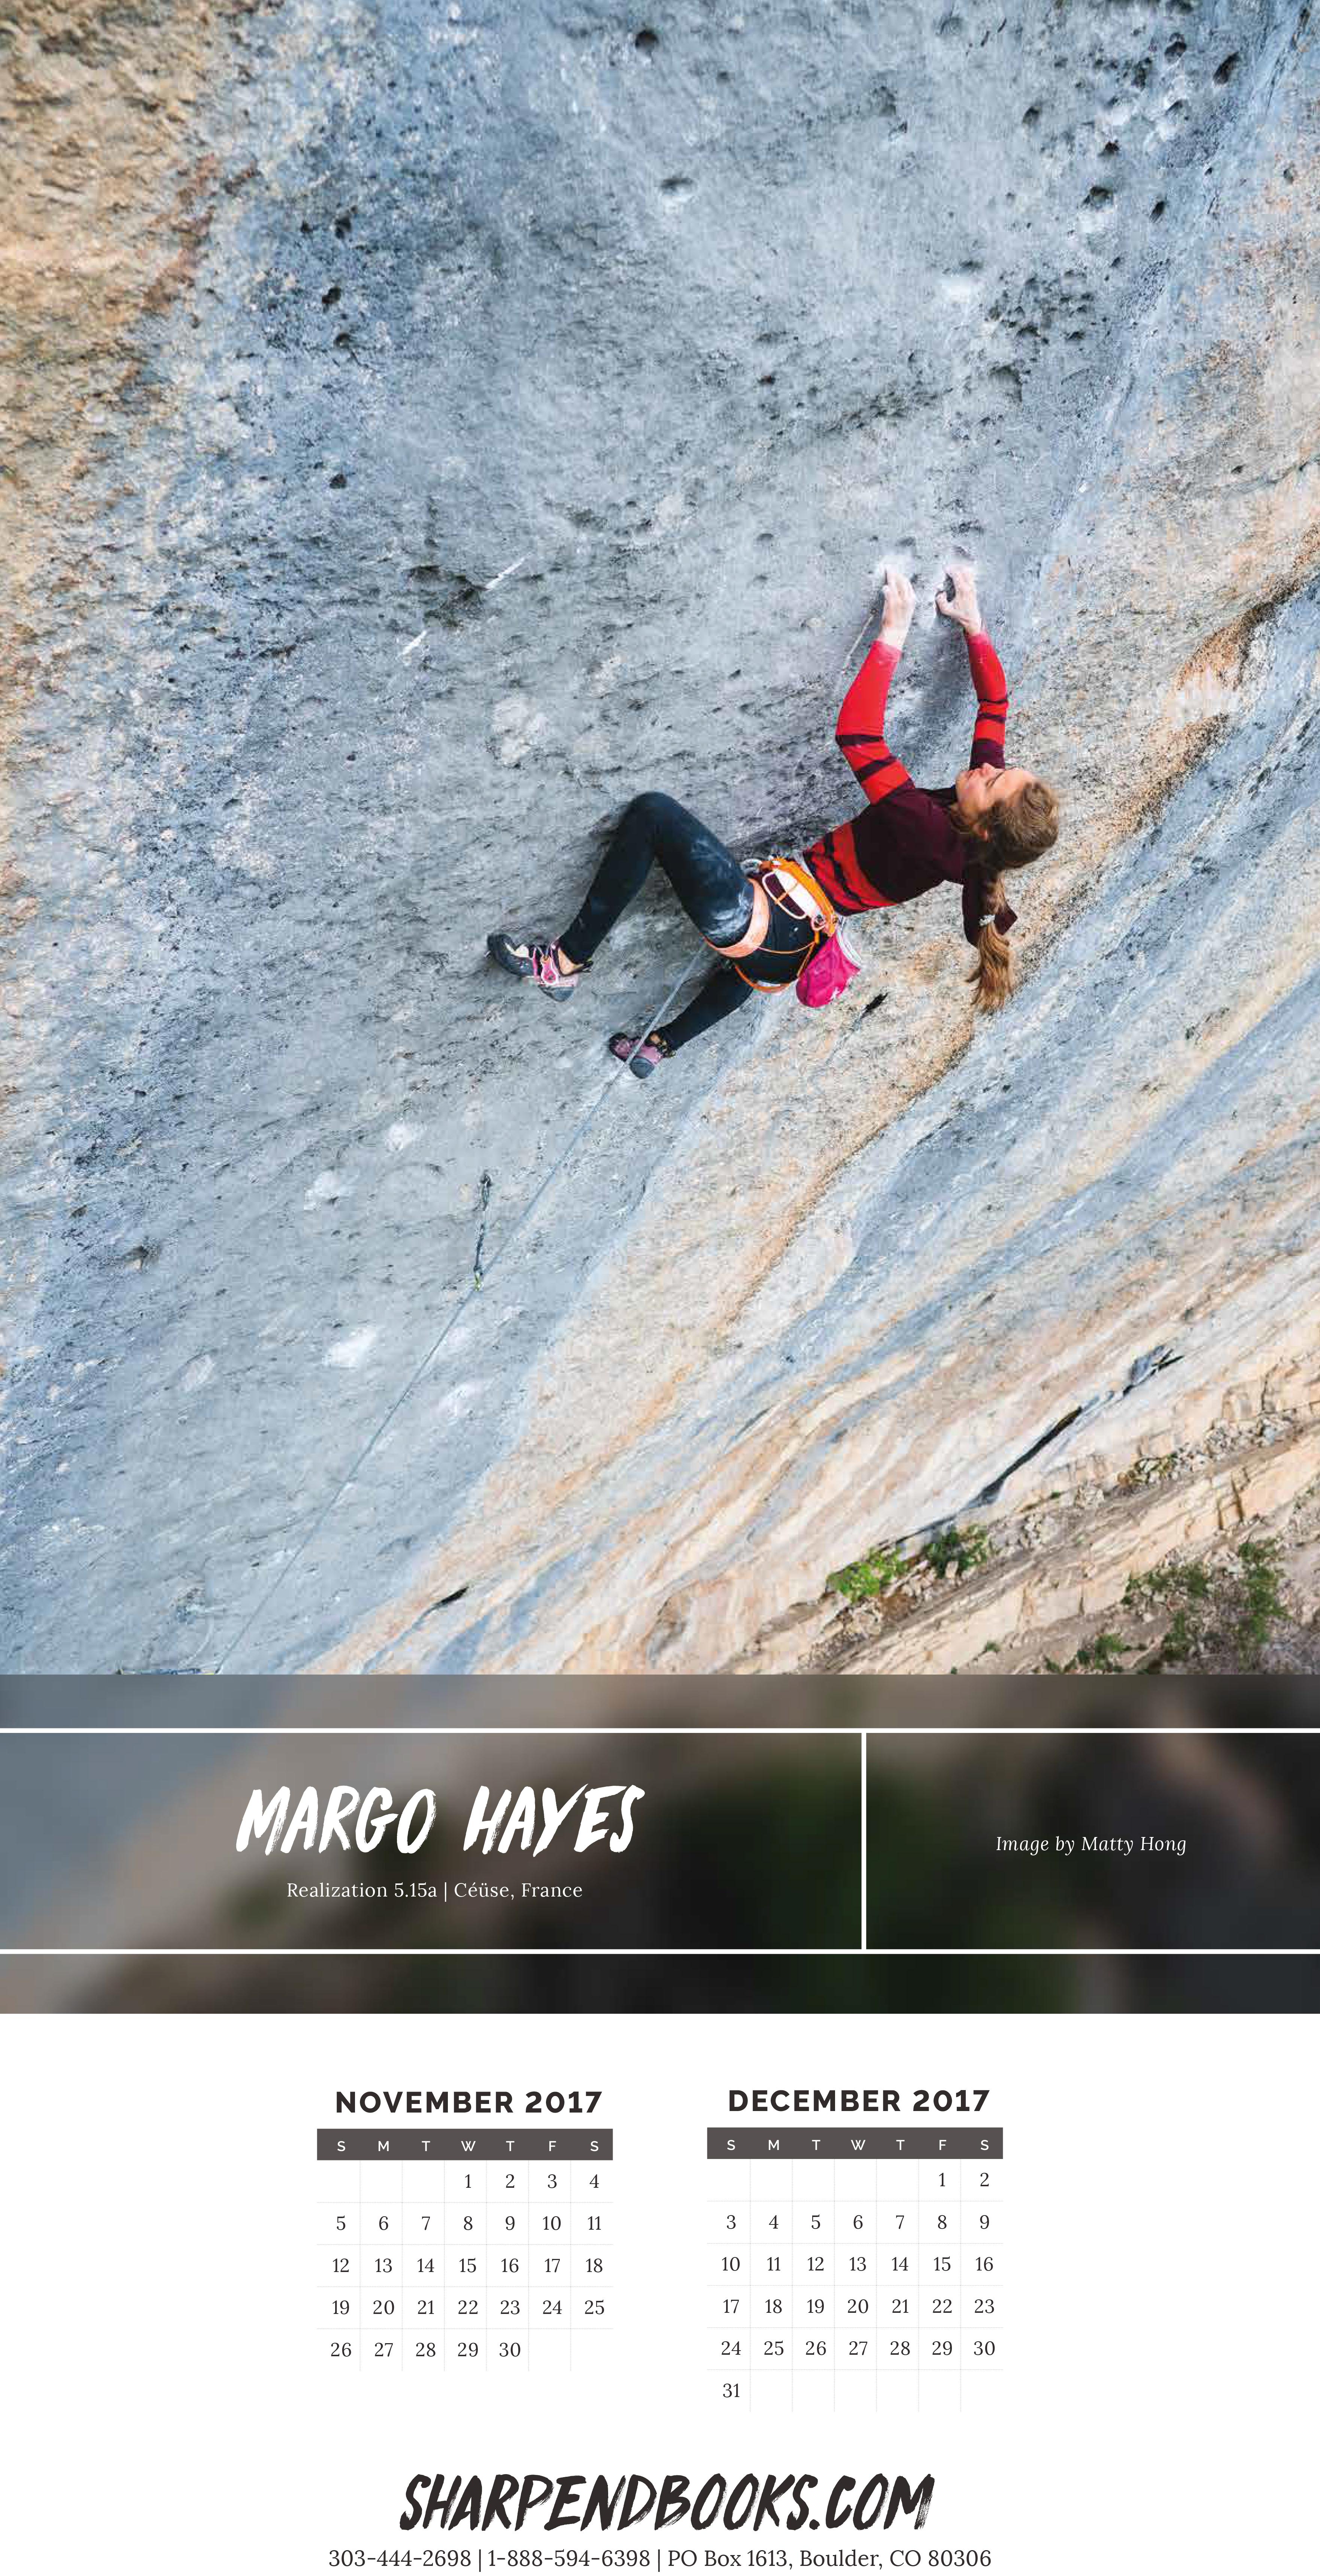 Margo Hayes sending Realization 5 15a … It's like a new